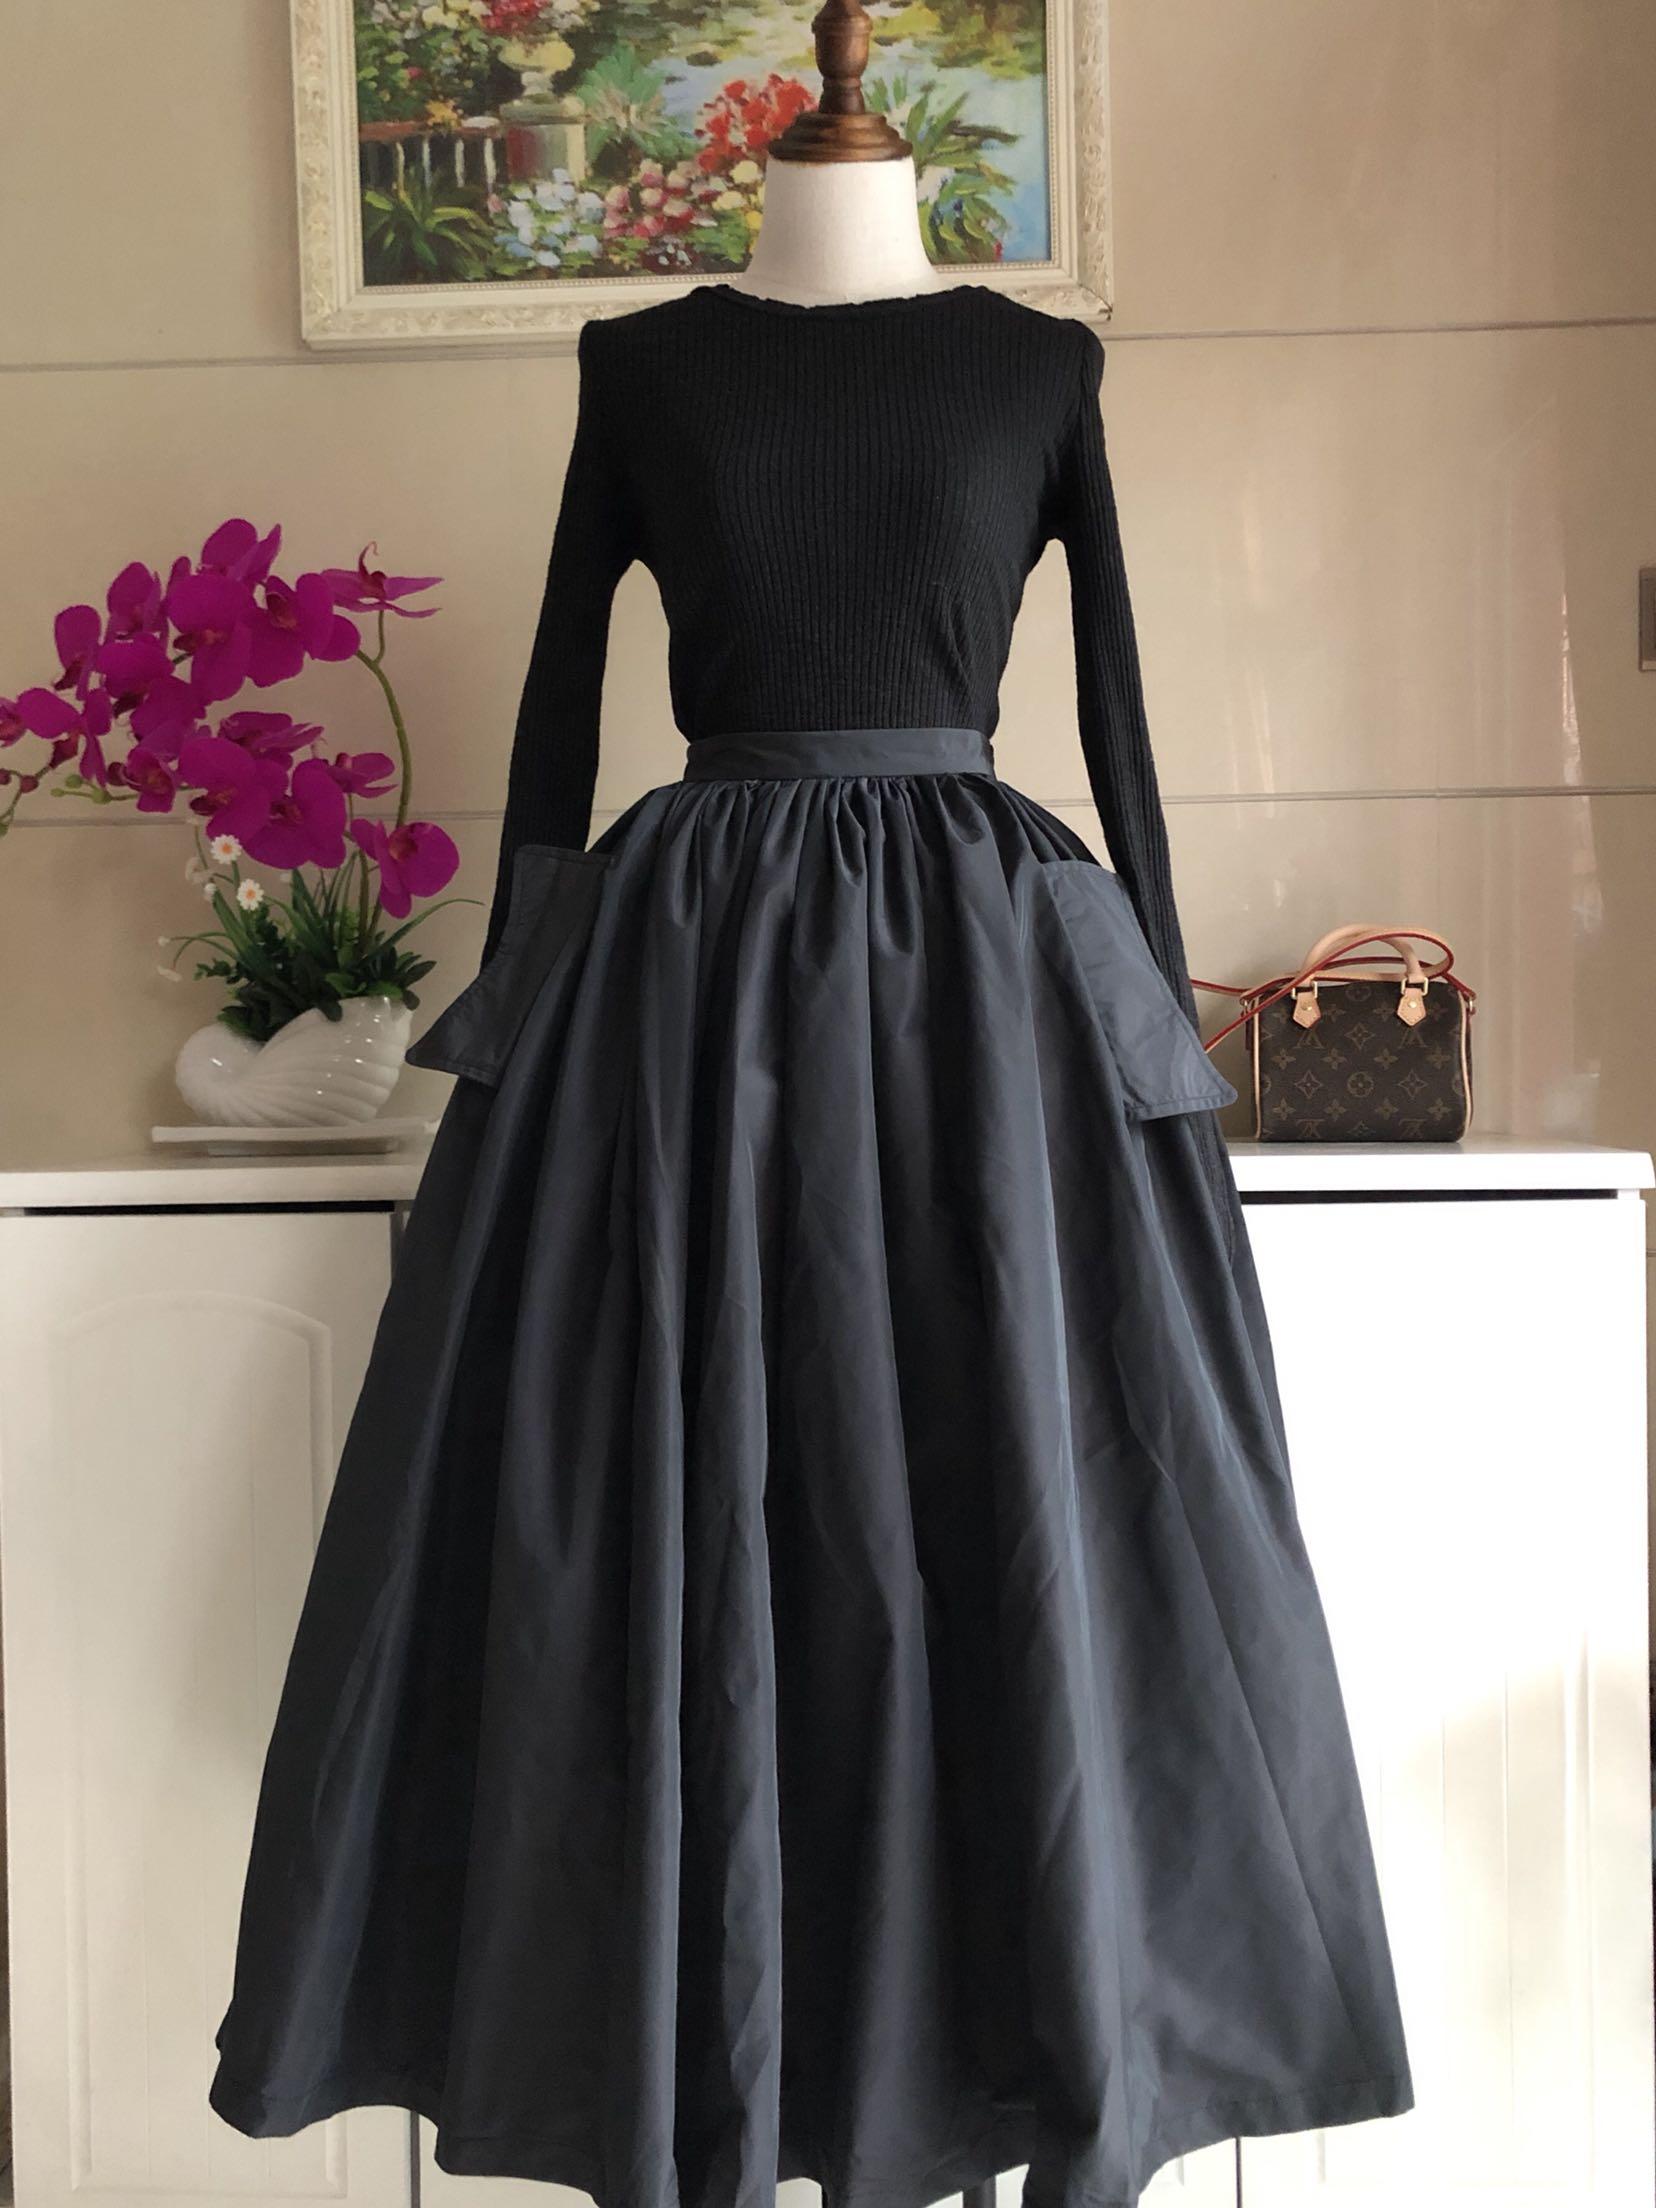 Aluonlineshop retro Hepburn high waist umbrella skirt for women